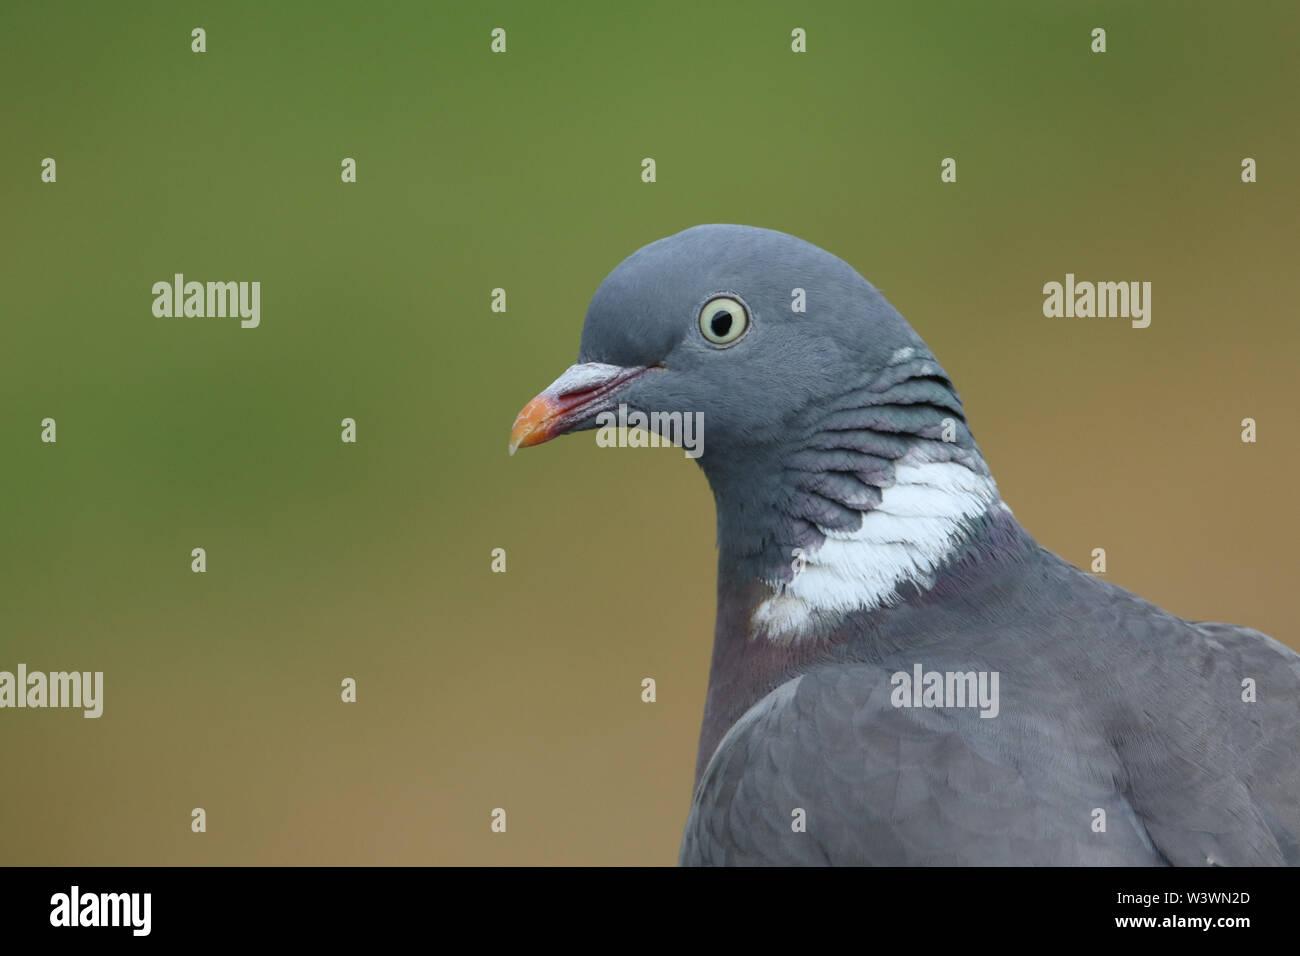 A pretty head shot of a Woodpidgeon, Columba palumbus. - Stock Image